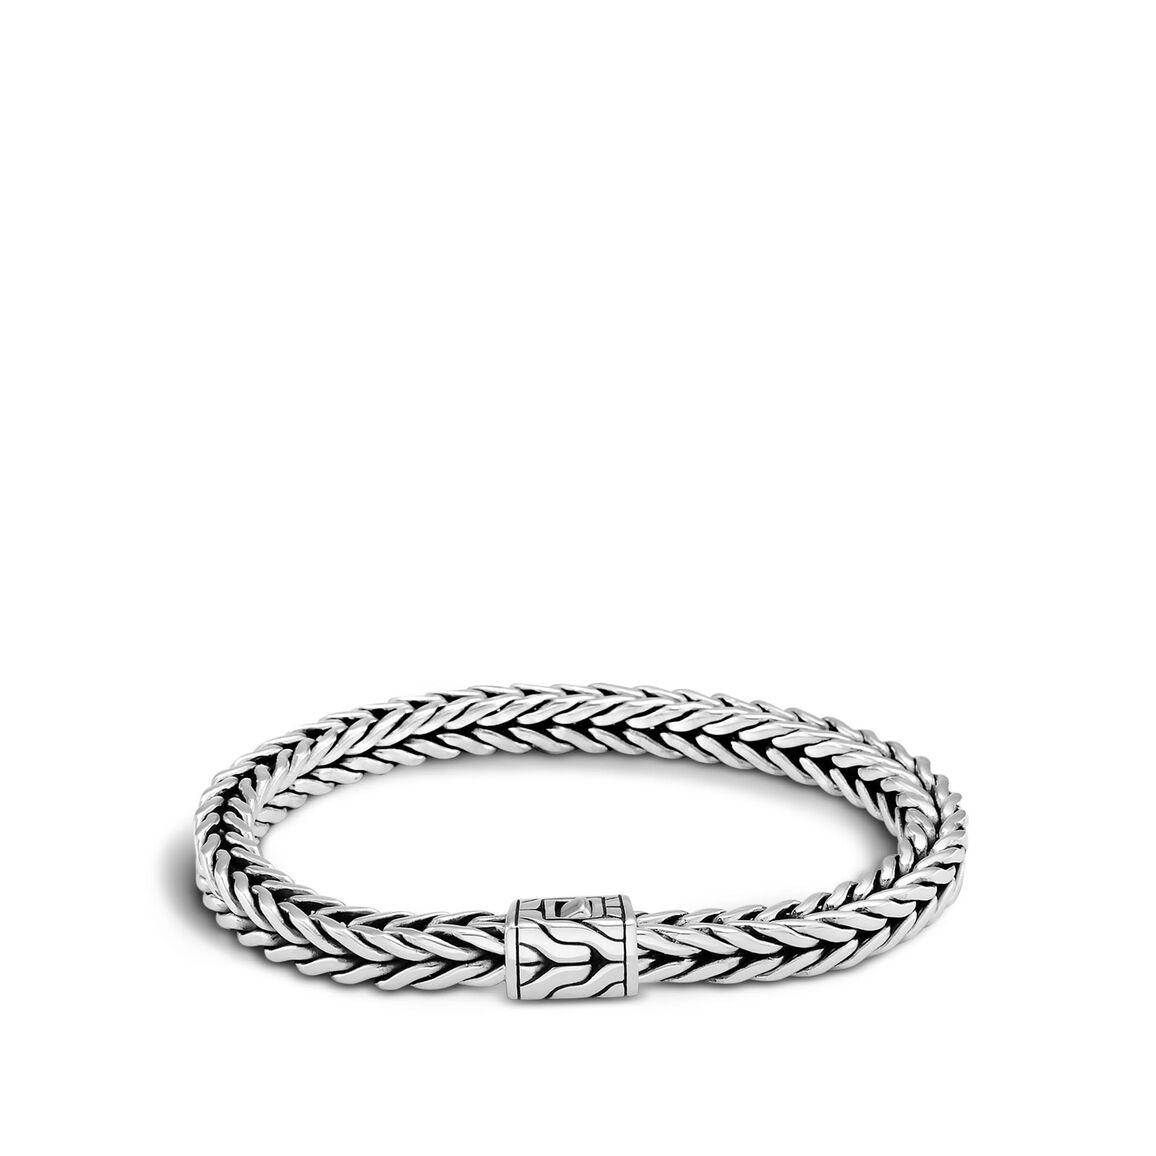 Classic Chain 6MM Bracelet in Silver